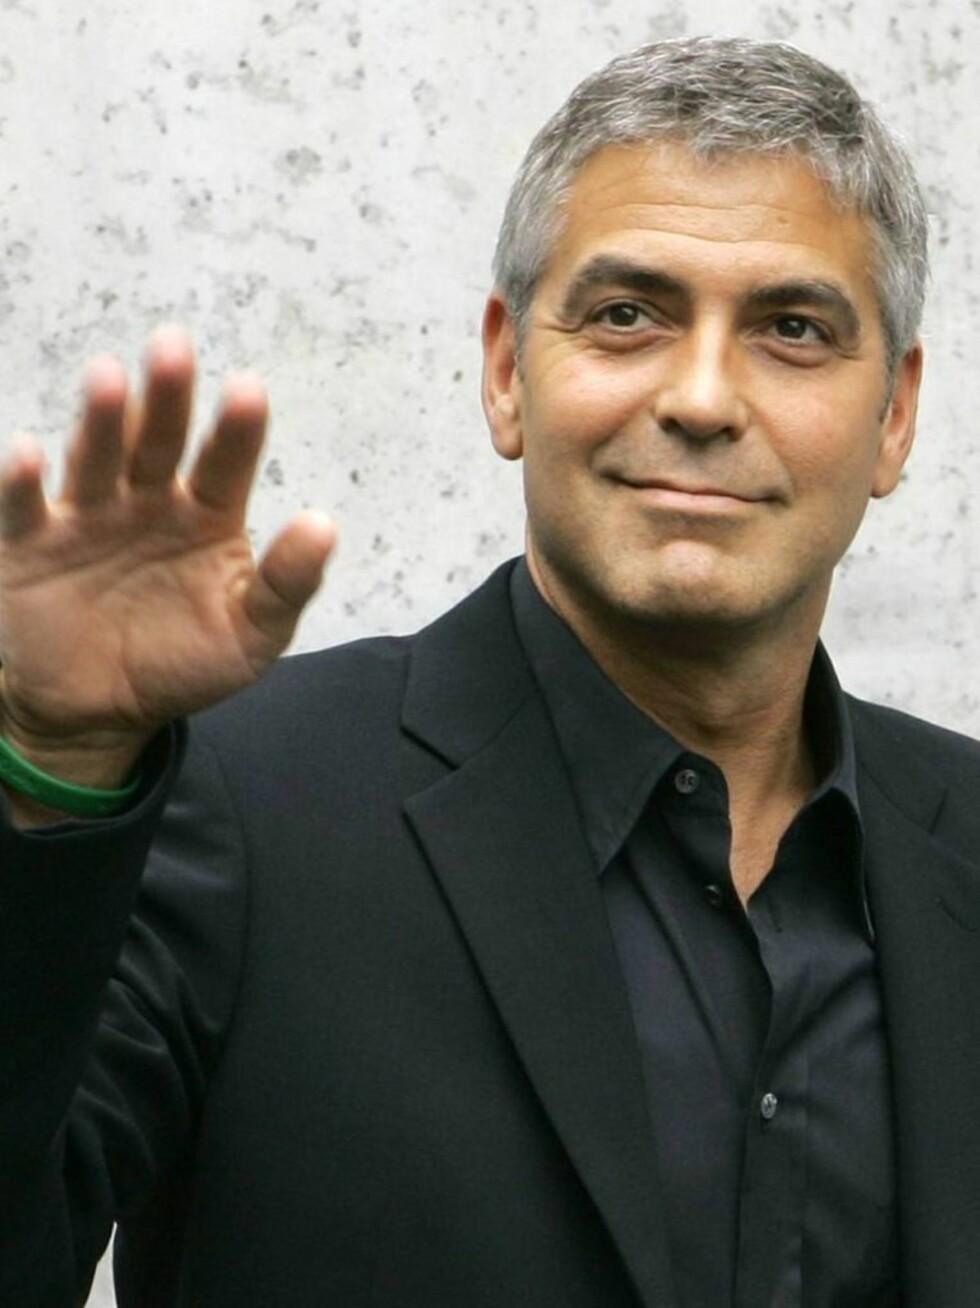 SLÅR TILBAKE: George Clooney vil ta hevn på fotografene. Foto: AP/Scanpix